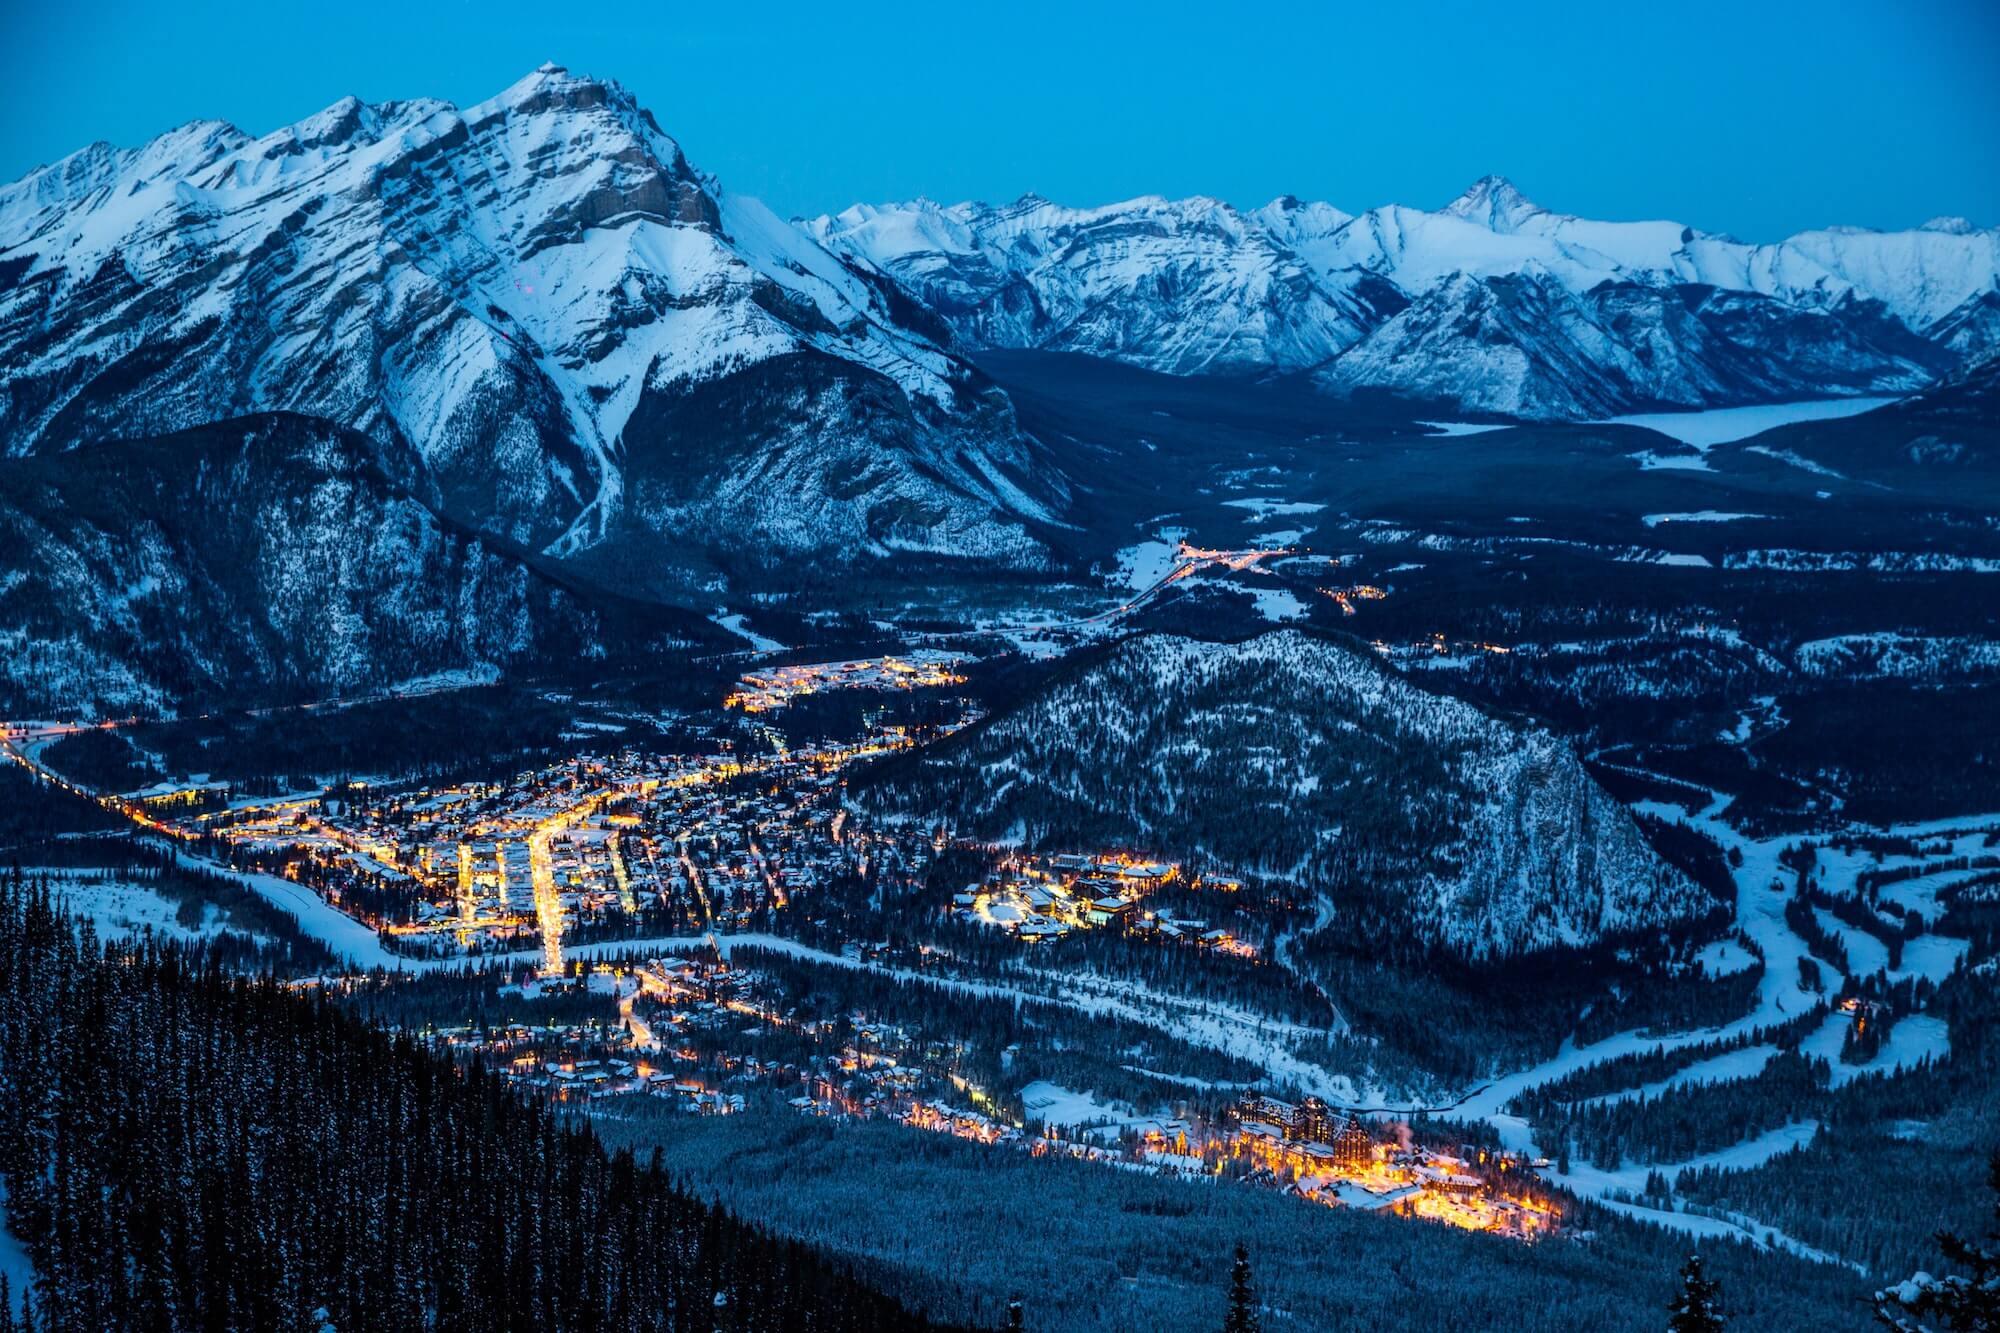 Banff town at night